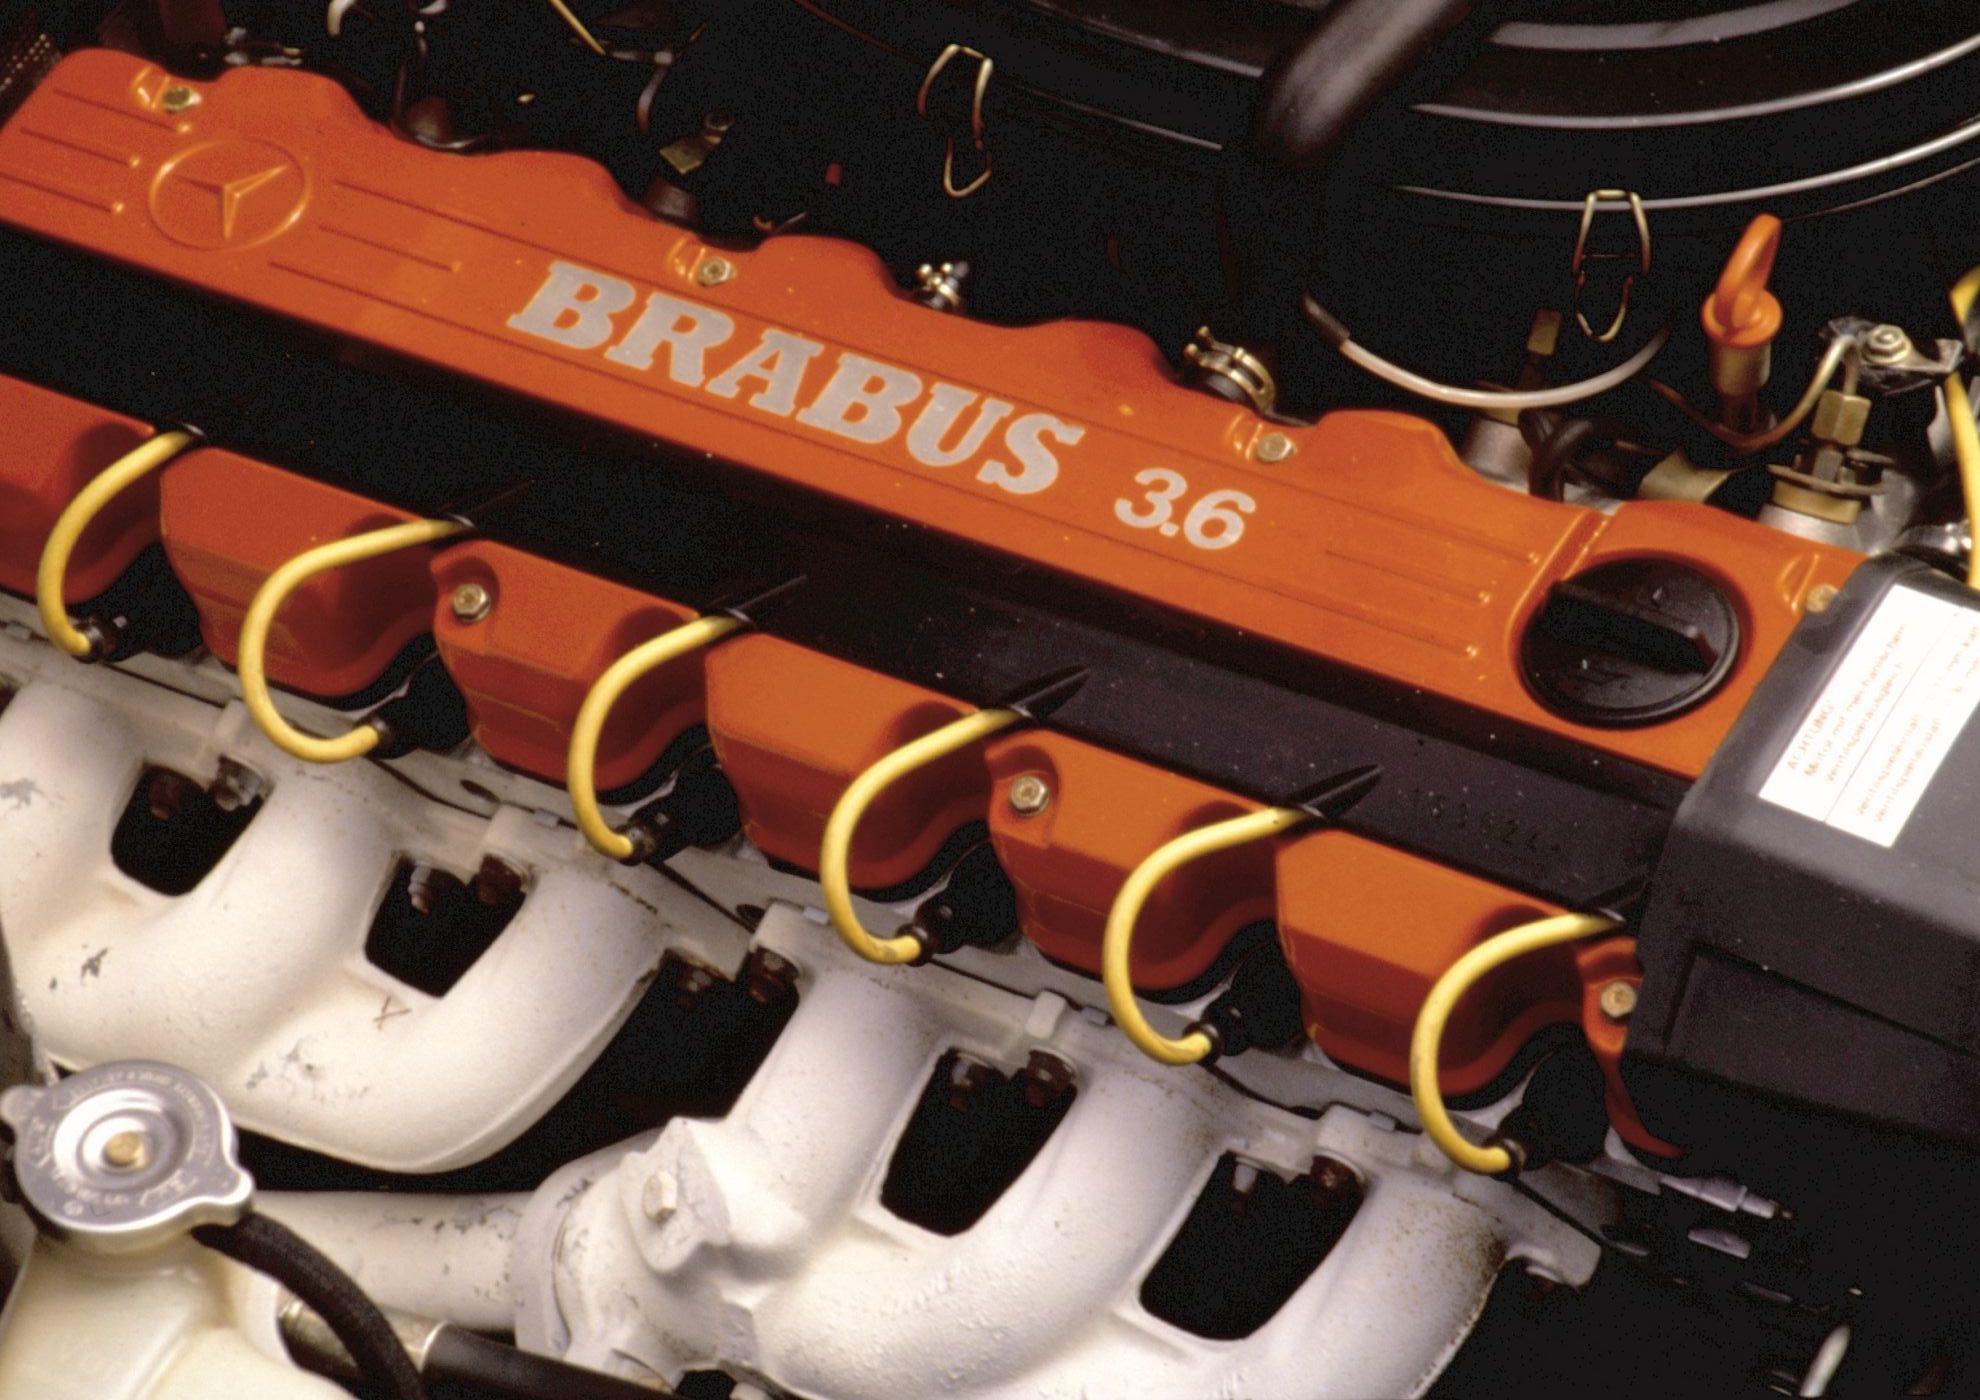 Brabus Motor